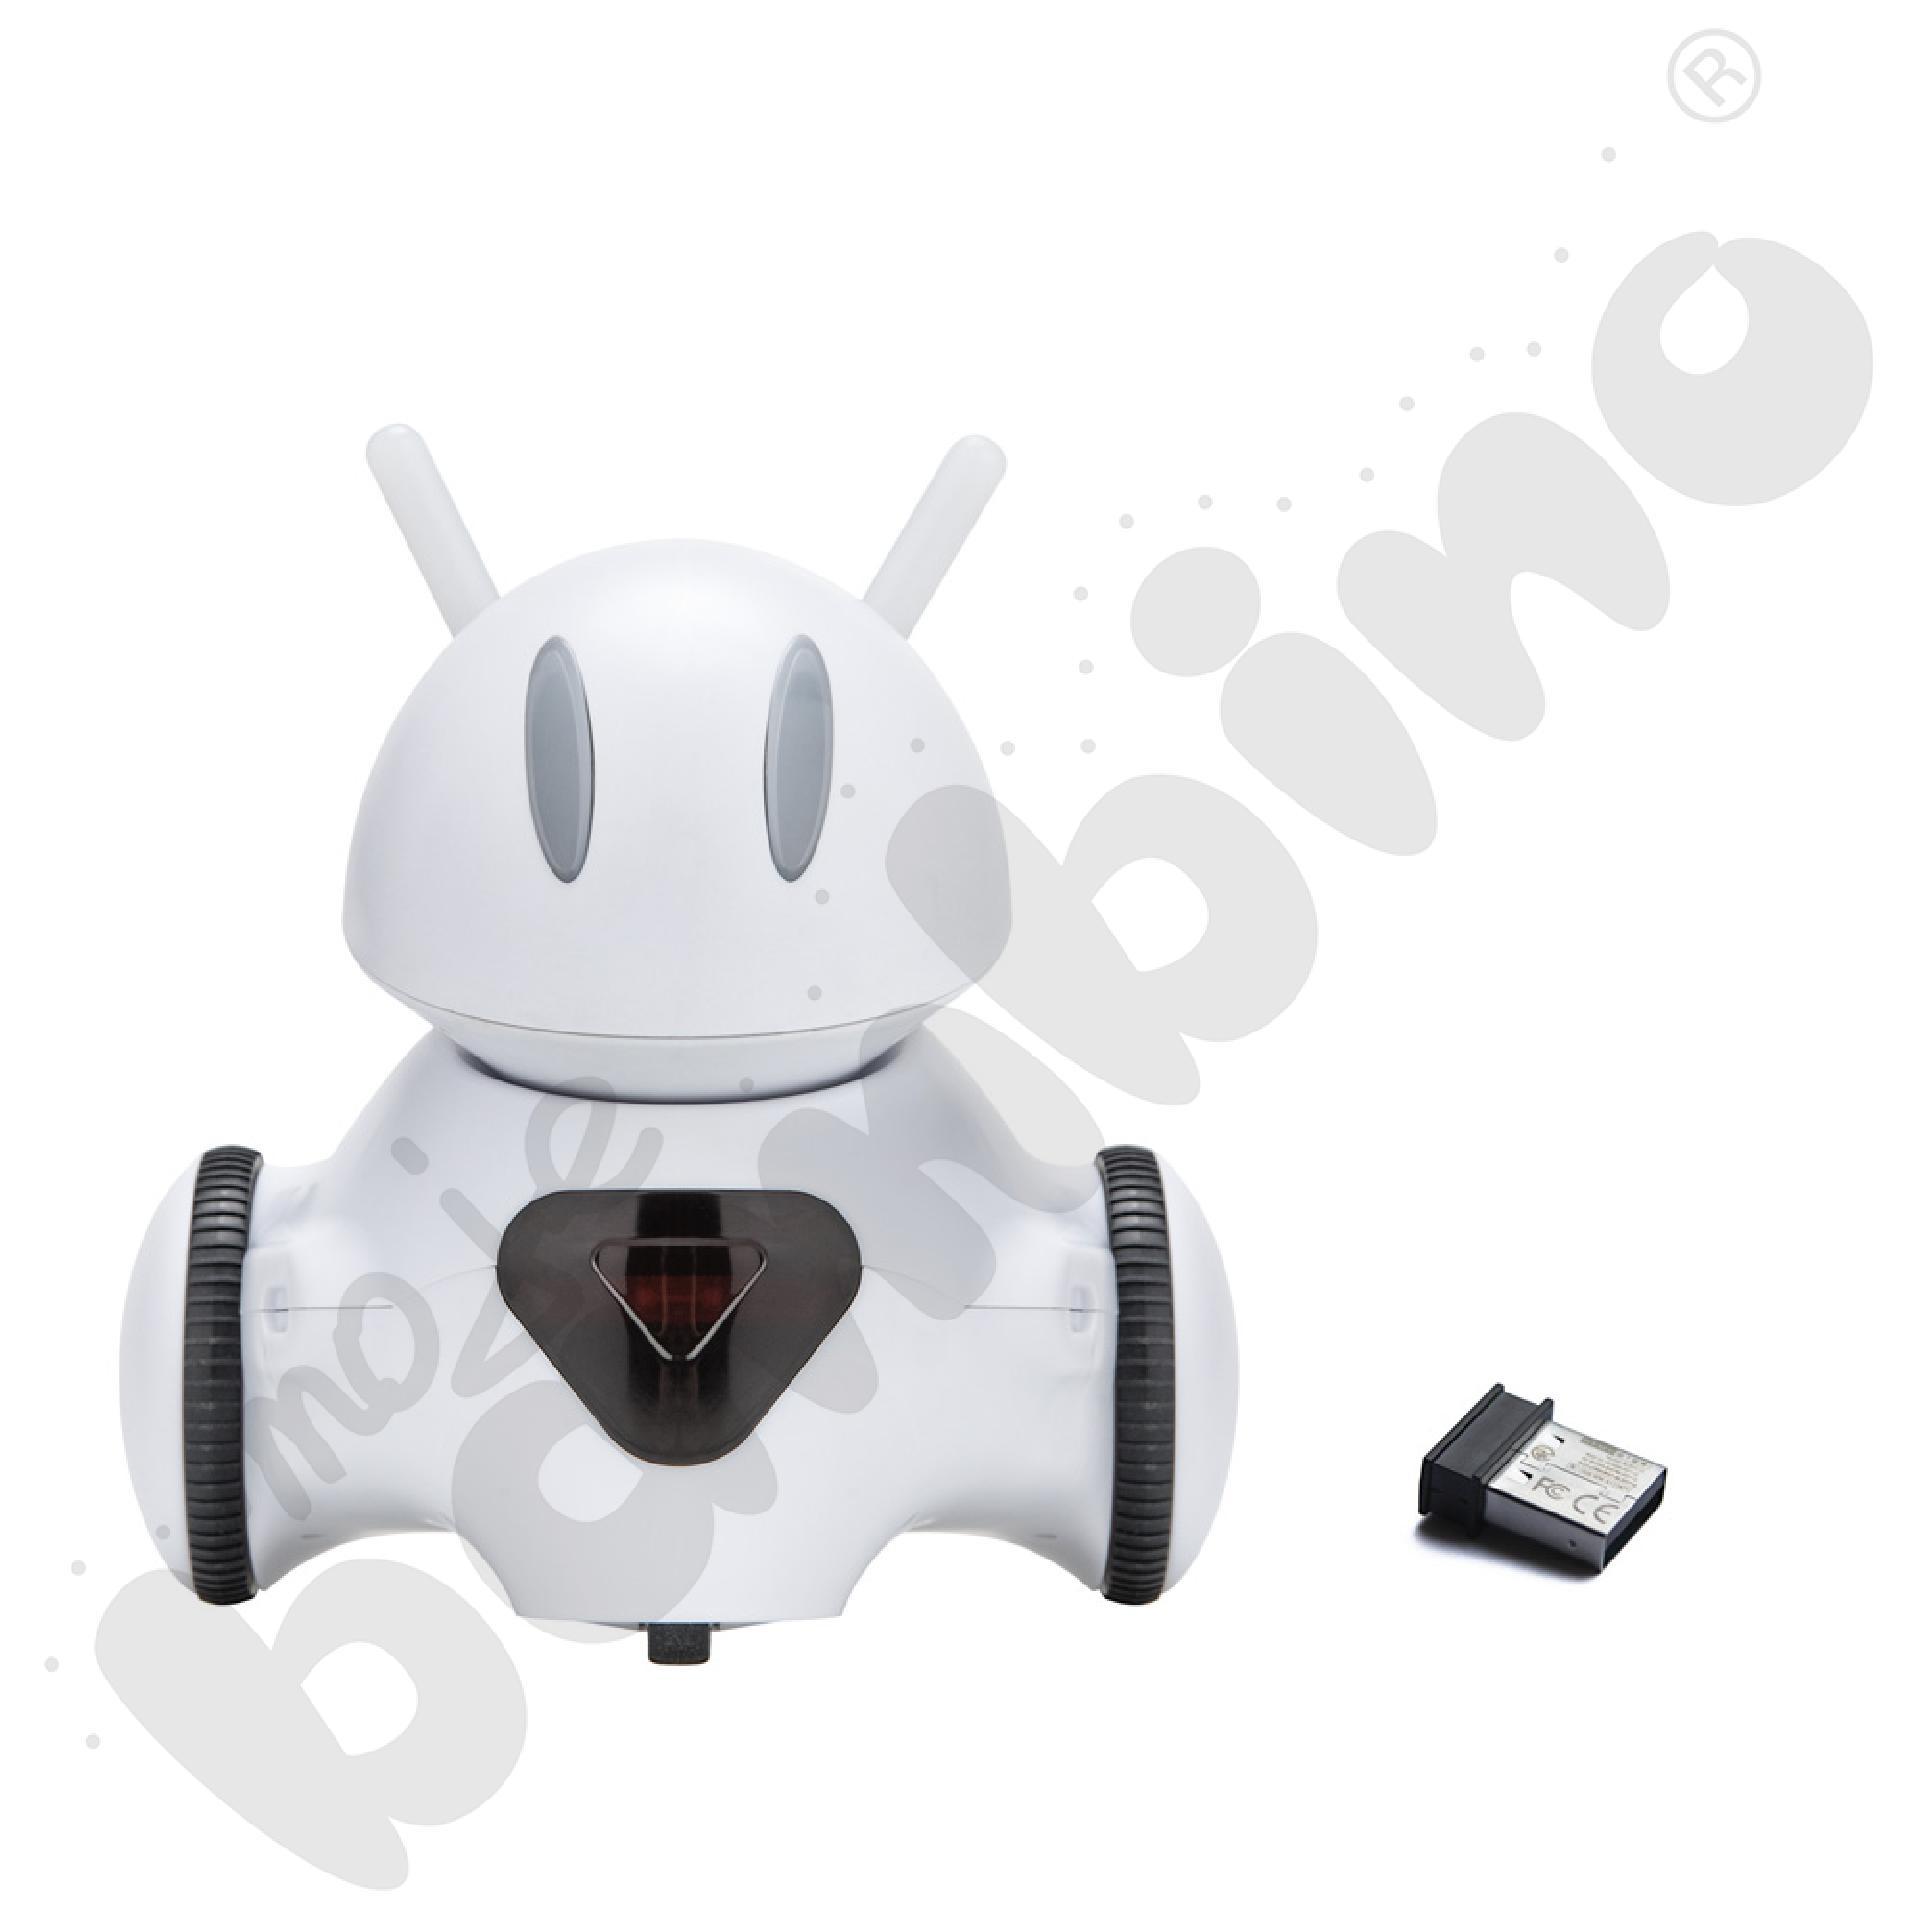 Zestaw: Robot Photon Edu + Magic Dongle